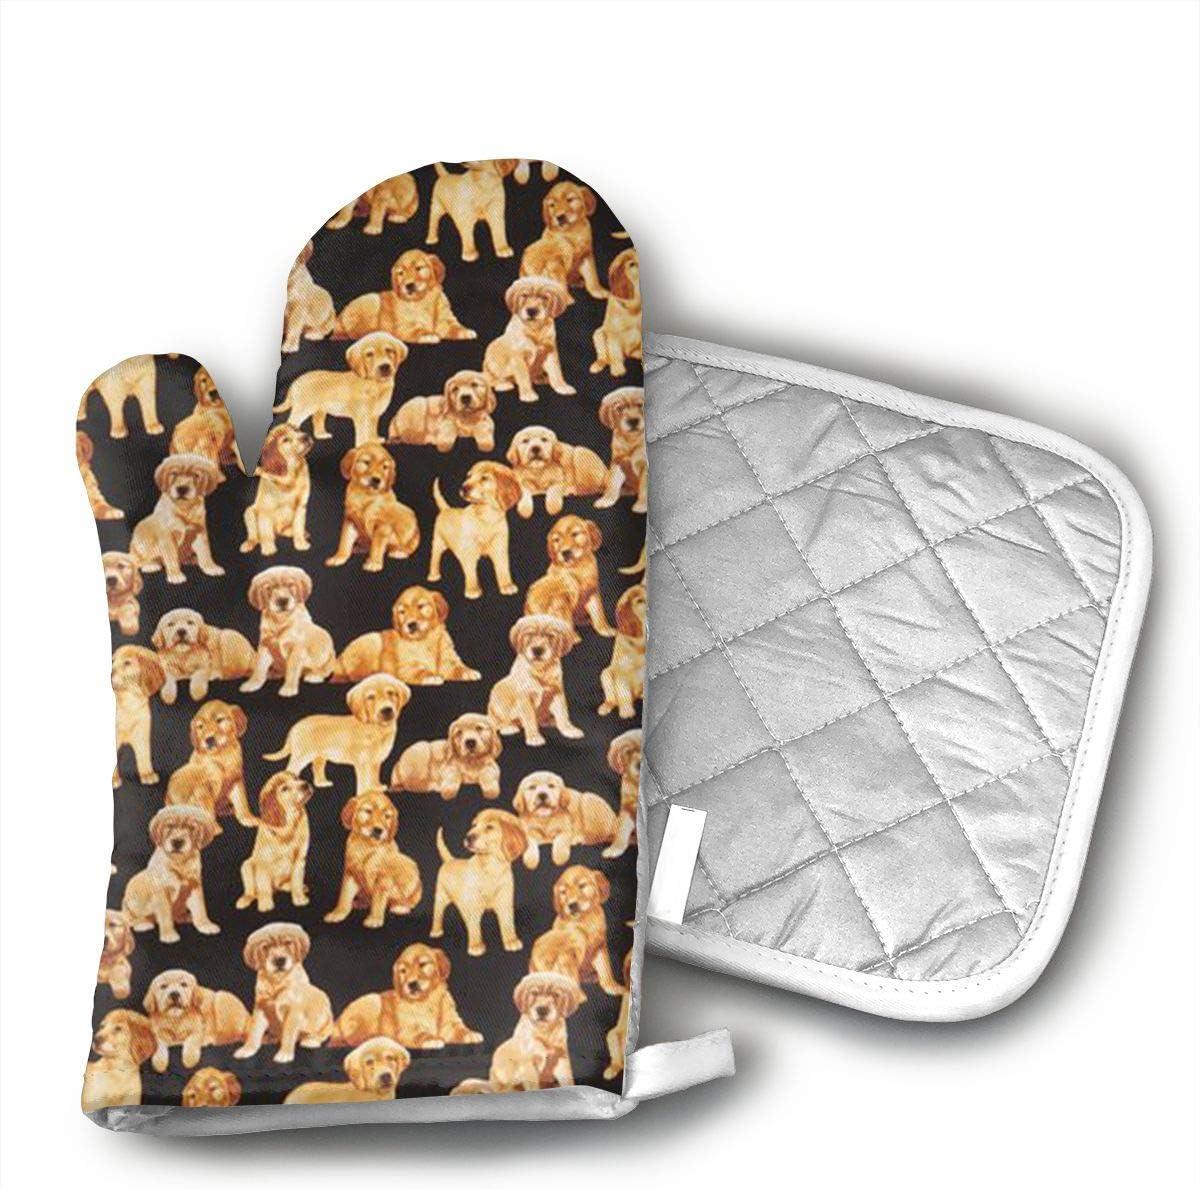 QEDGC Black Golden Retriever Dog Puppy Oven Hot Mitts Professional Heat Resistant Pot Holder & Baking Gloves